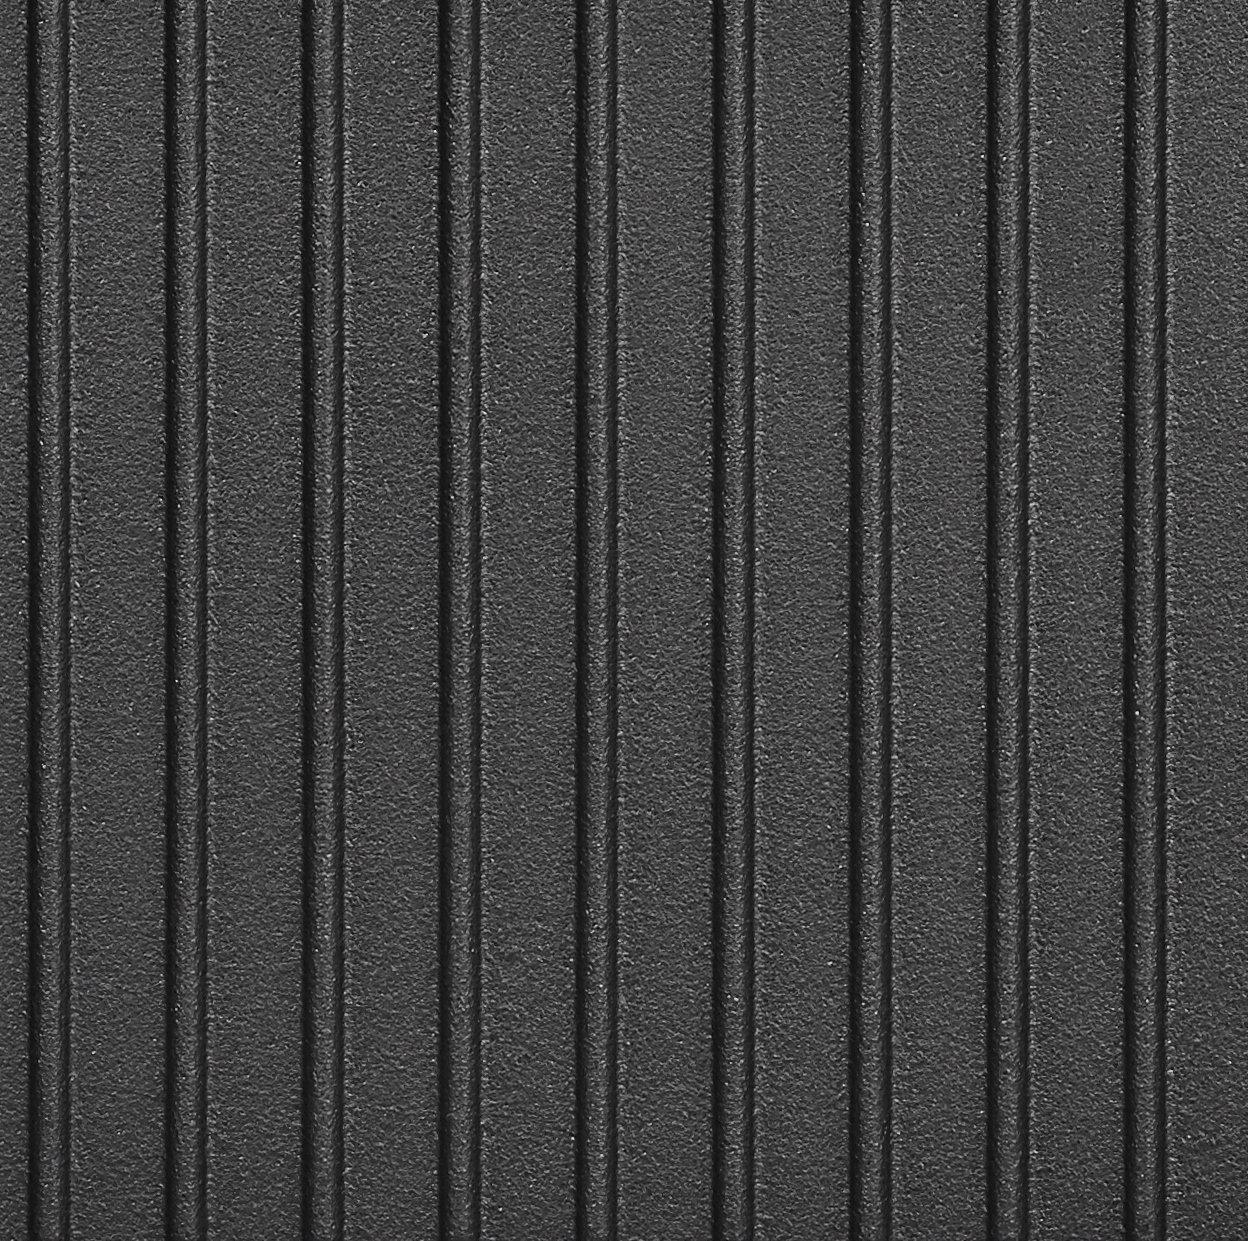 AmazonBasics Pre-Seasoned Cast Iron Reversible Grill/Griddle -(5204) by AmazonBasics (Image #2)